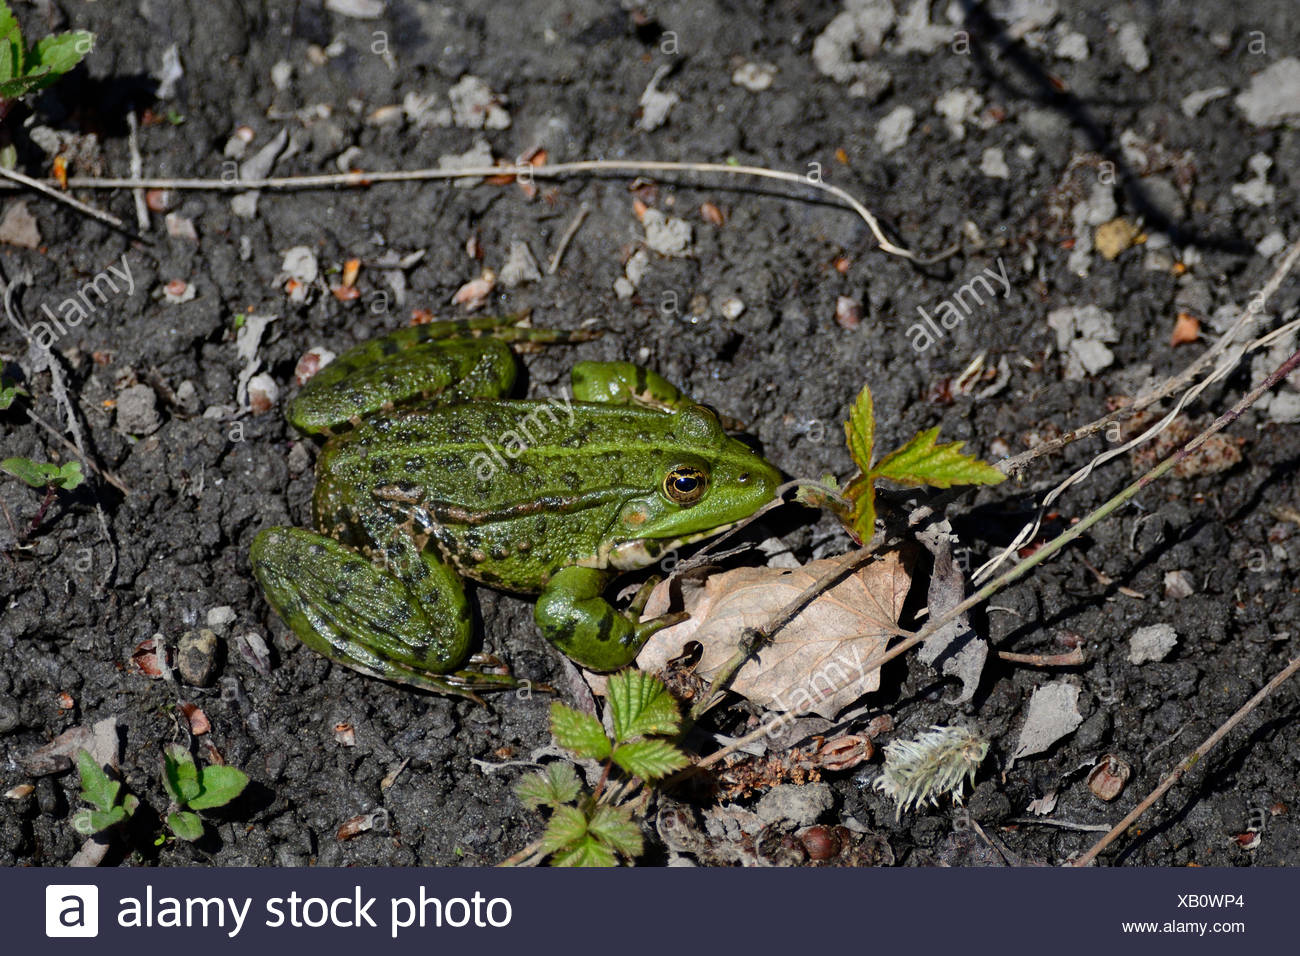 Edible frog, Rana esculenta, Ranidae, frog, amphibious animal, animal, mating, Champ-Pittet, Grande Cariçaie, nature reserve, Yv - Stock Image